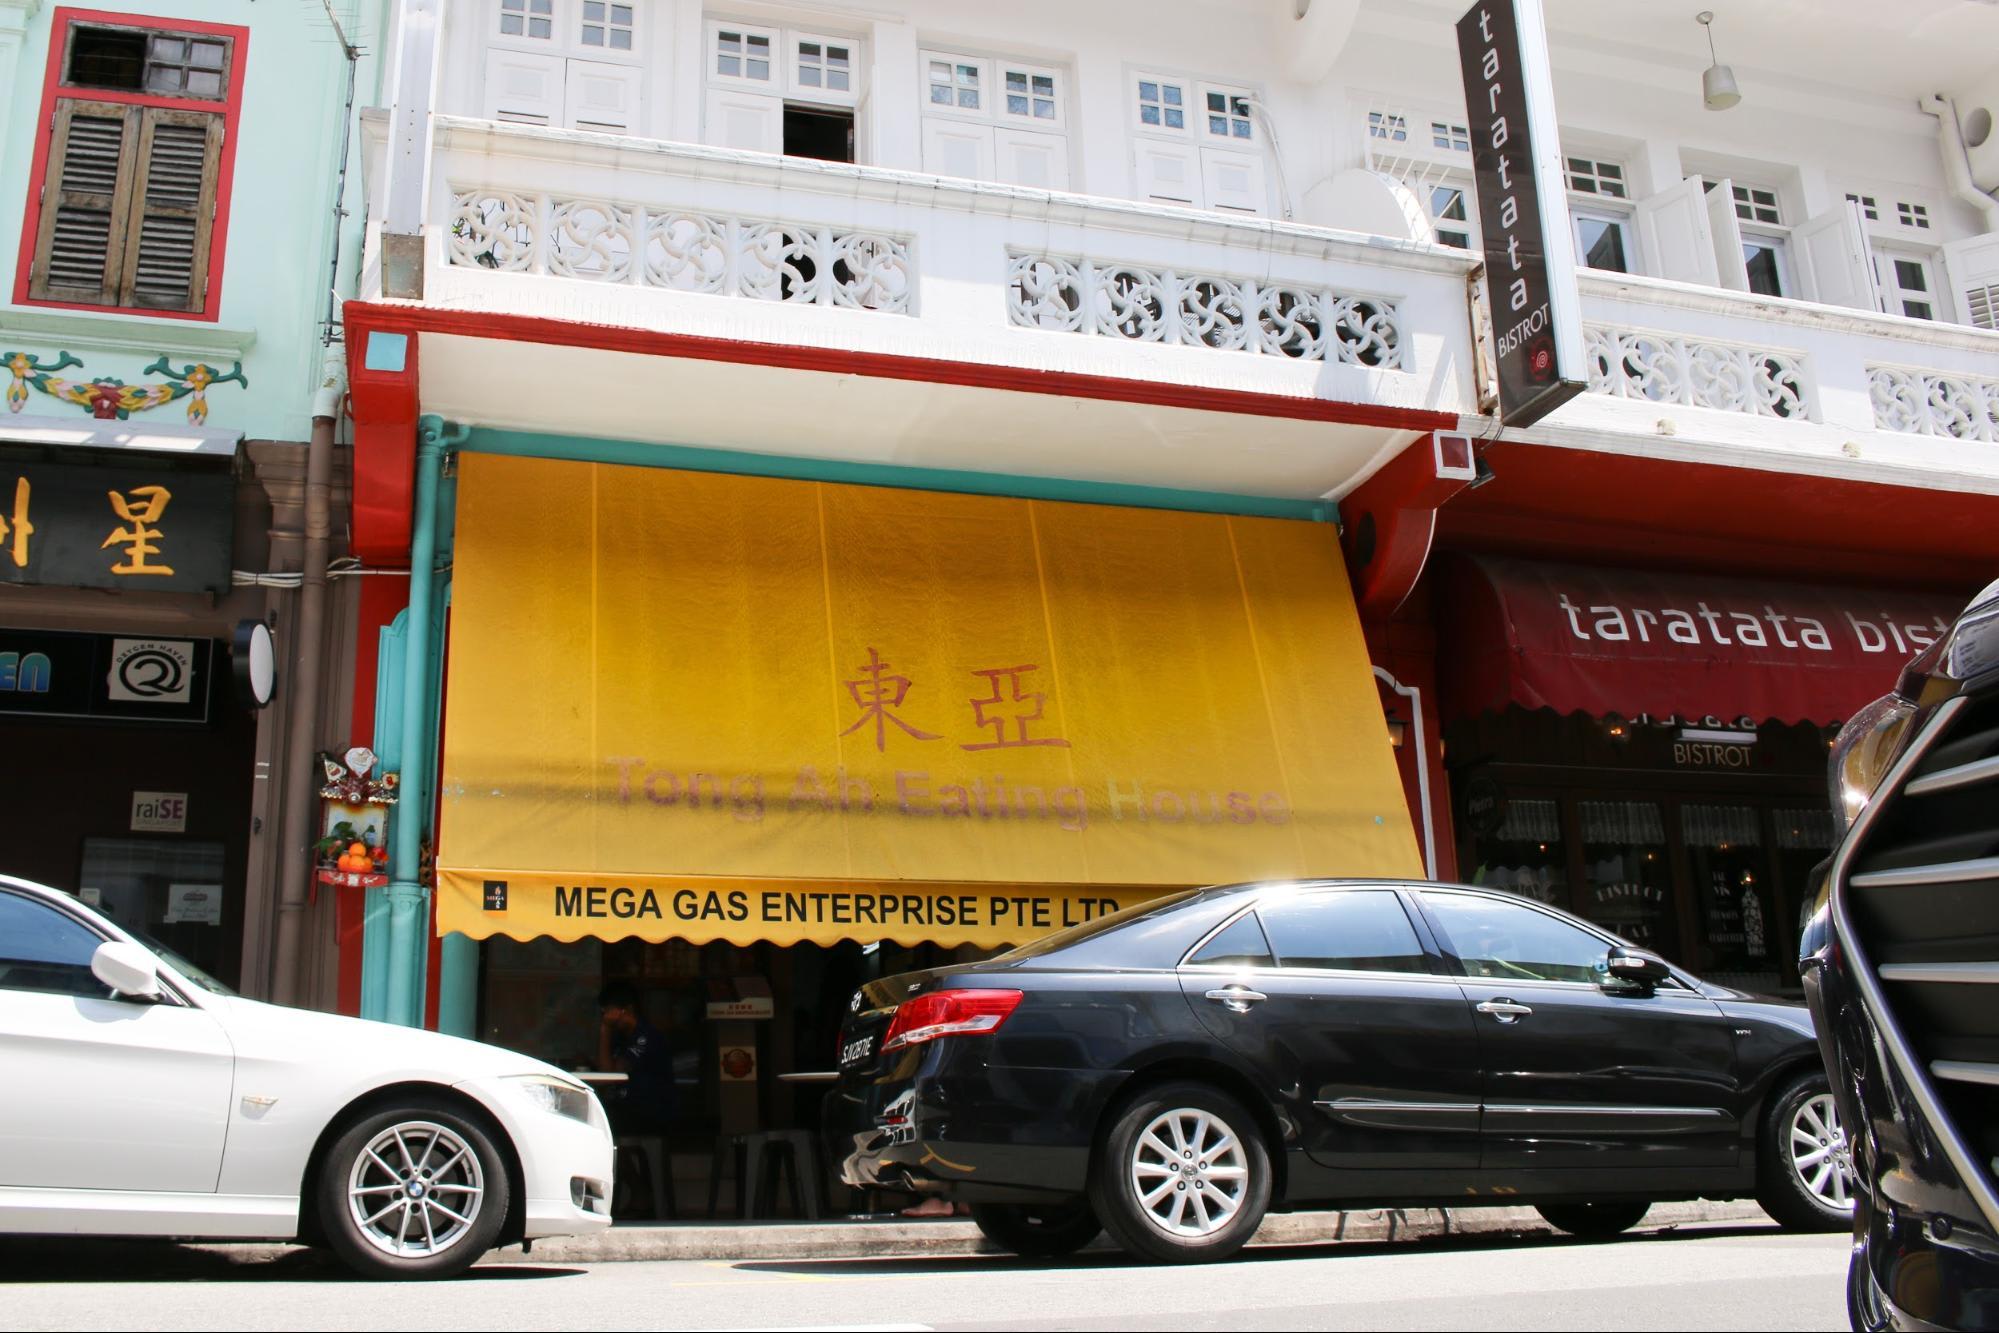 tiệm tong ah eating house